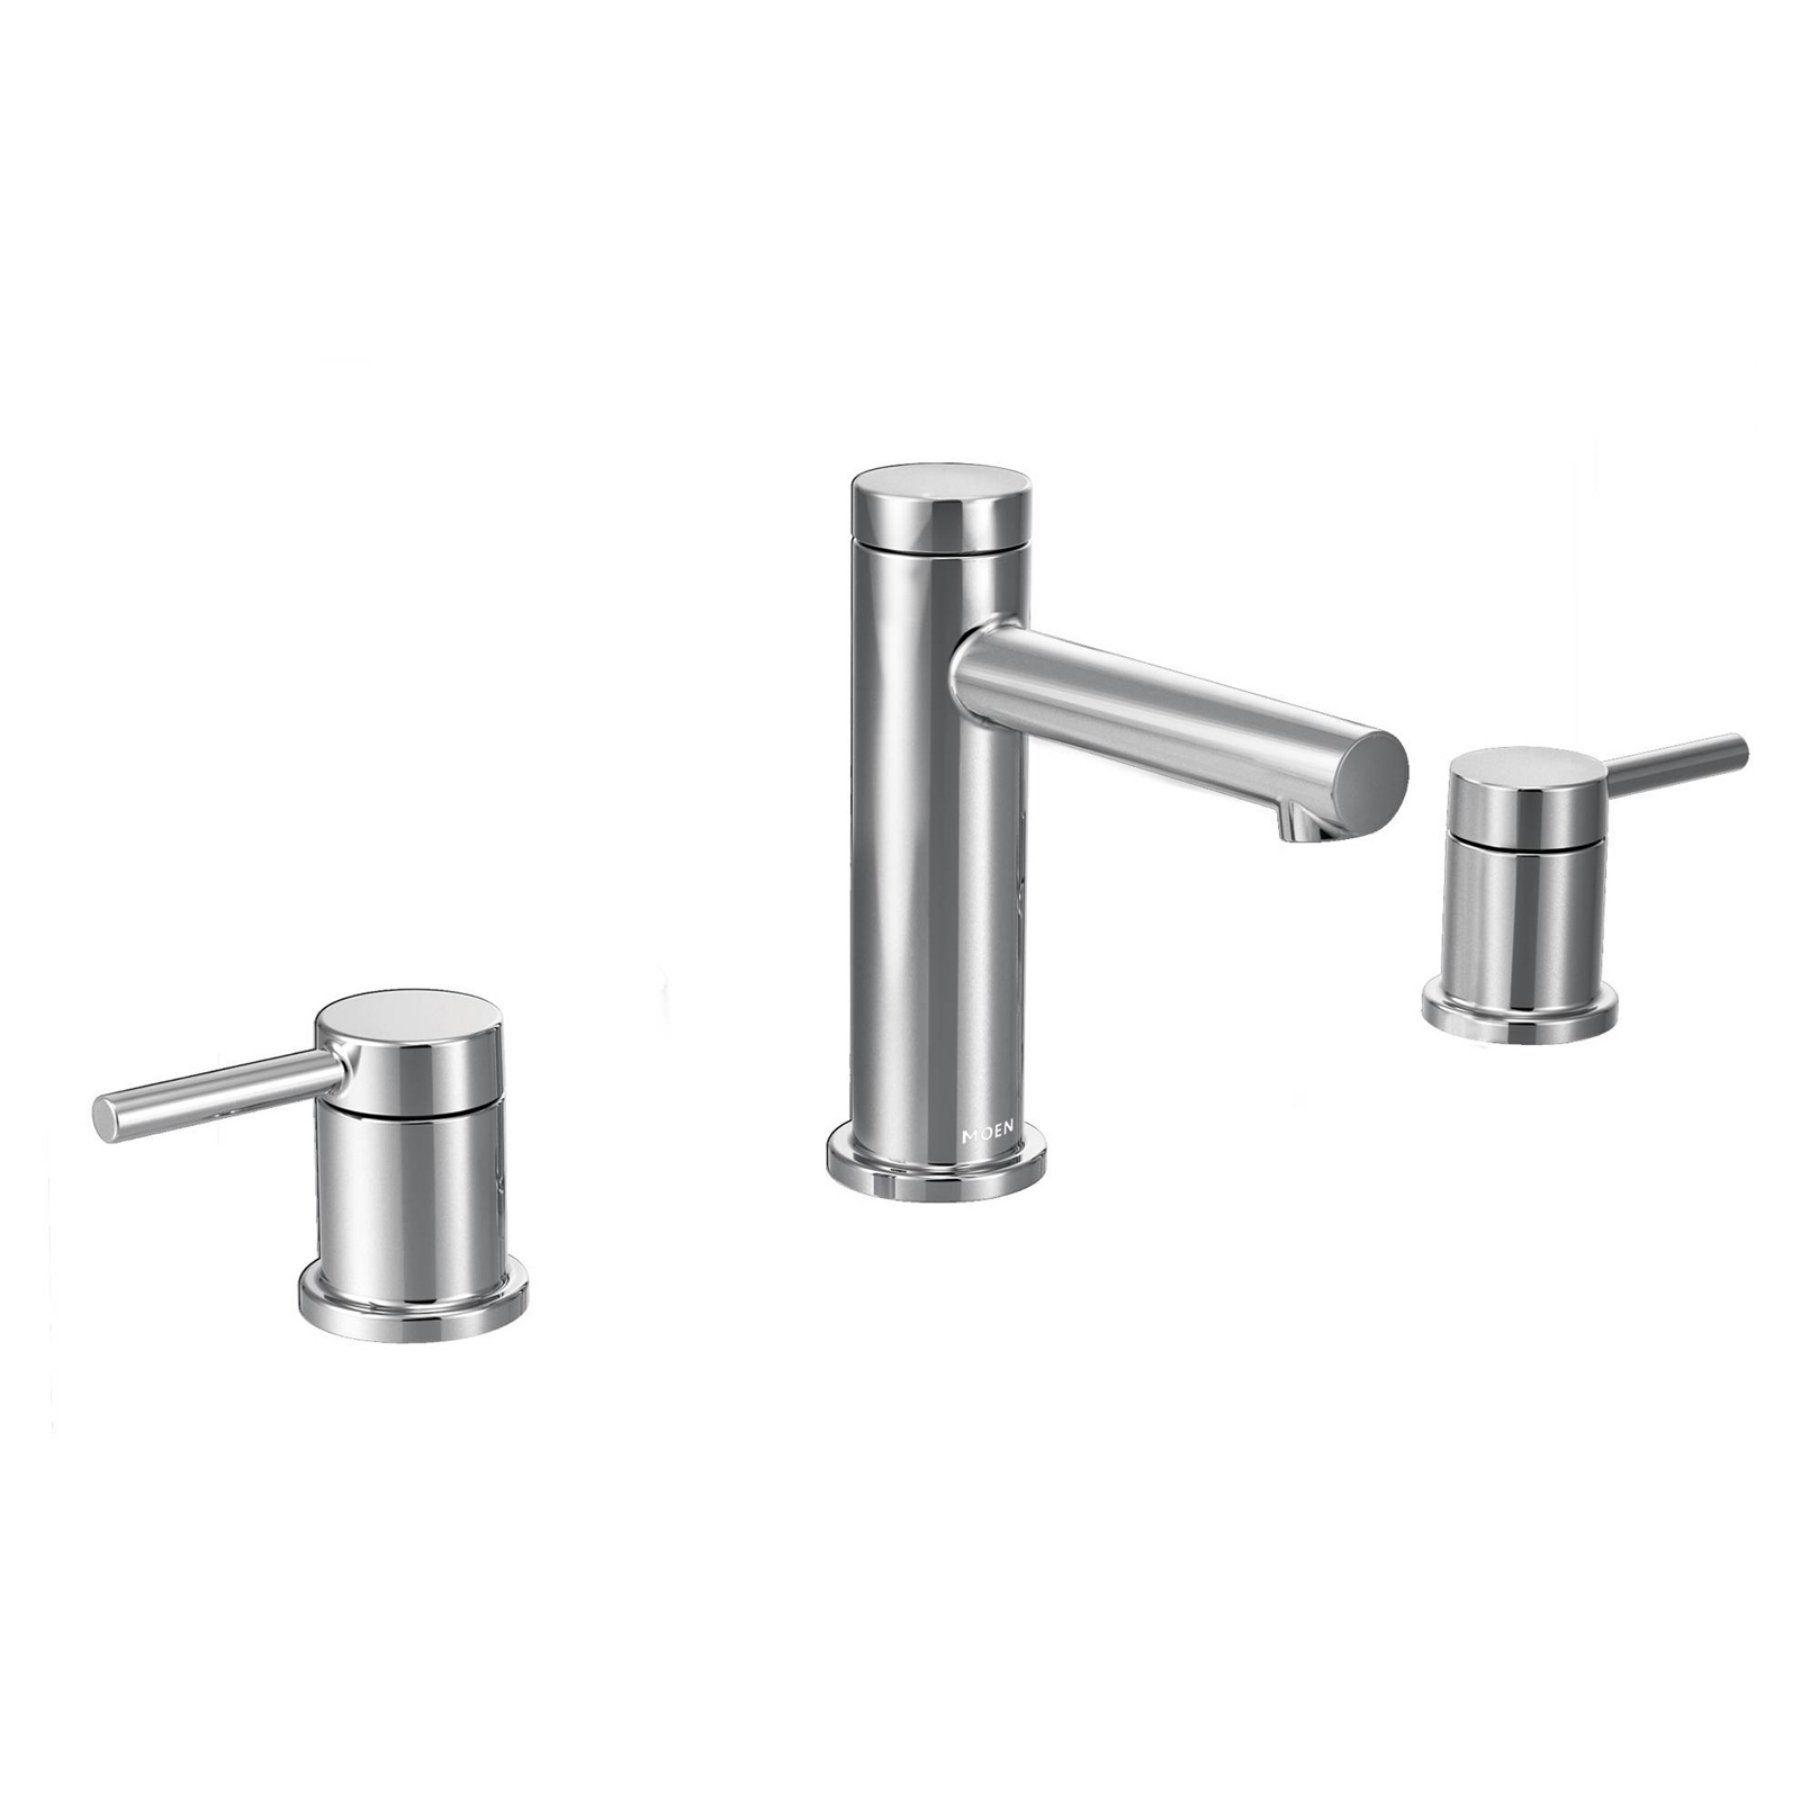 Moen Align Chrome Two-Handle High Arc Bathroom Faucet - MT6193 ...